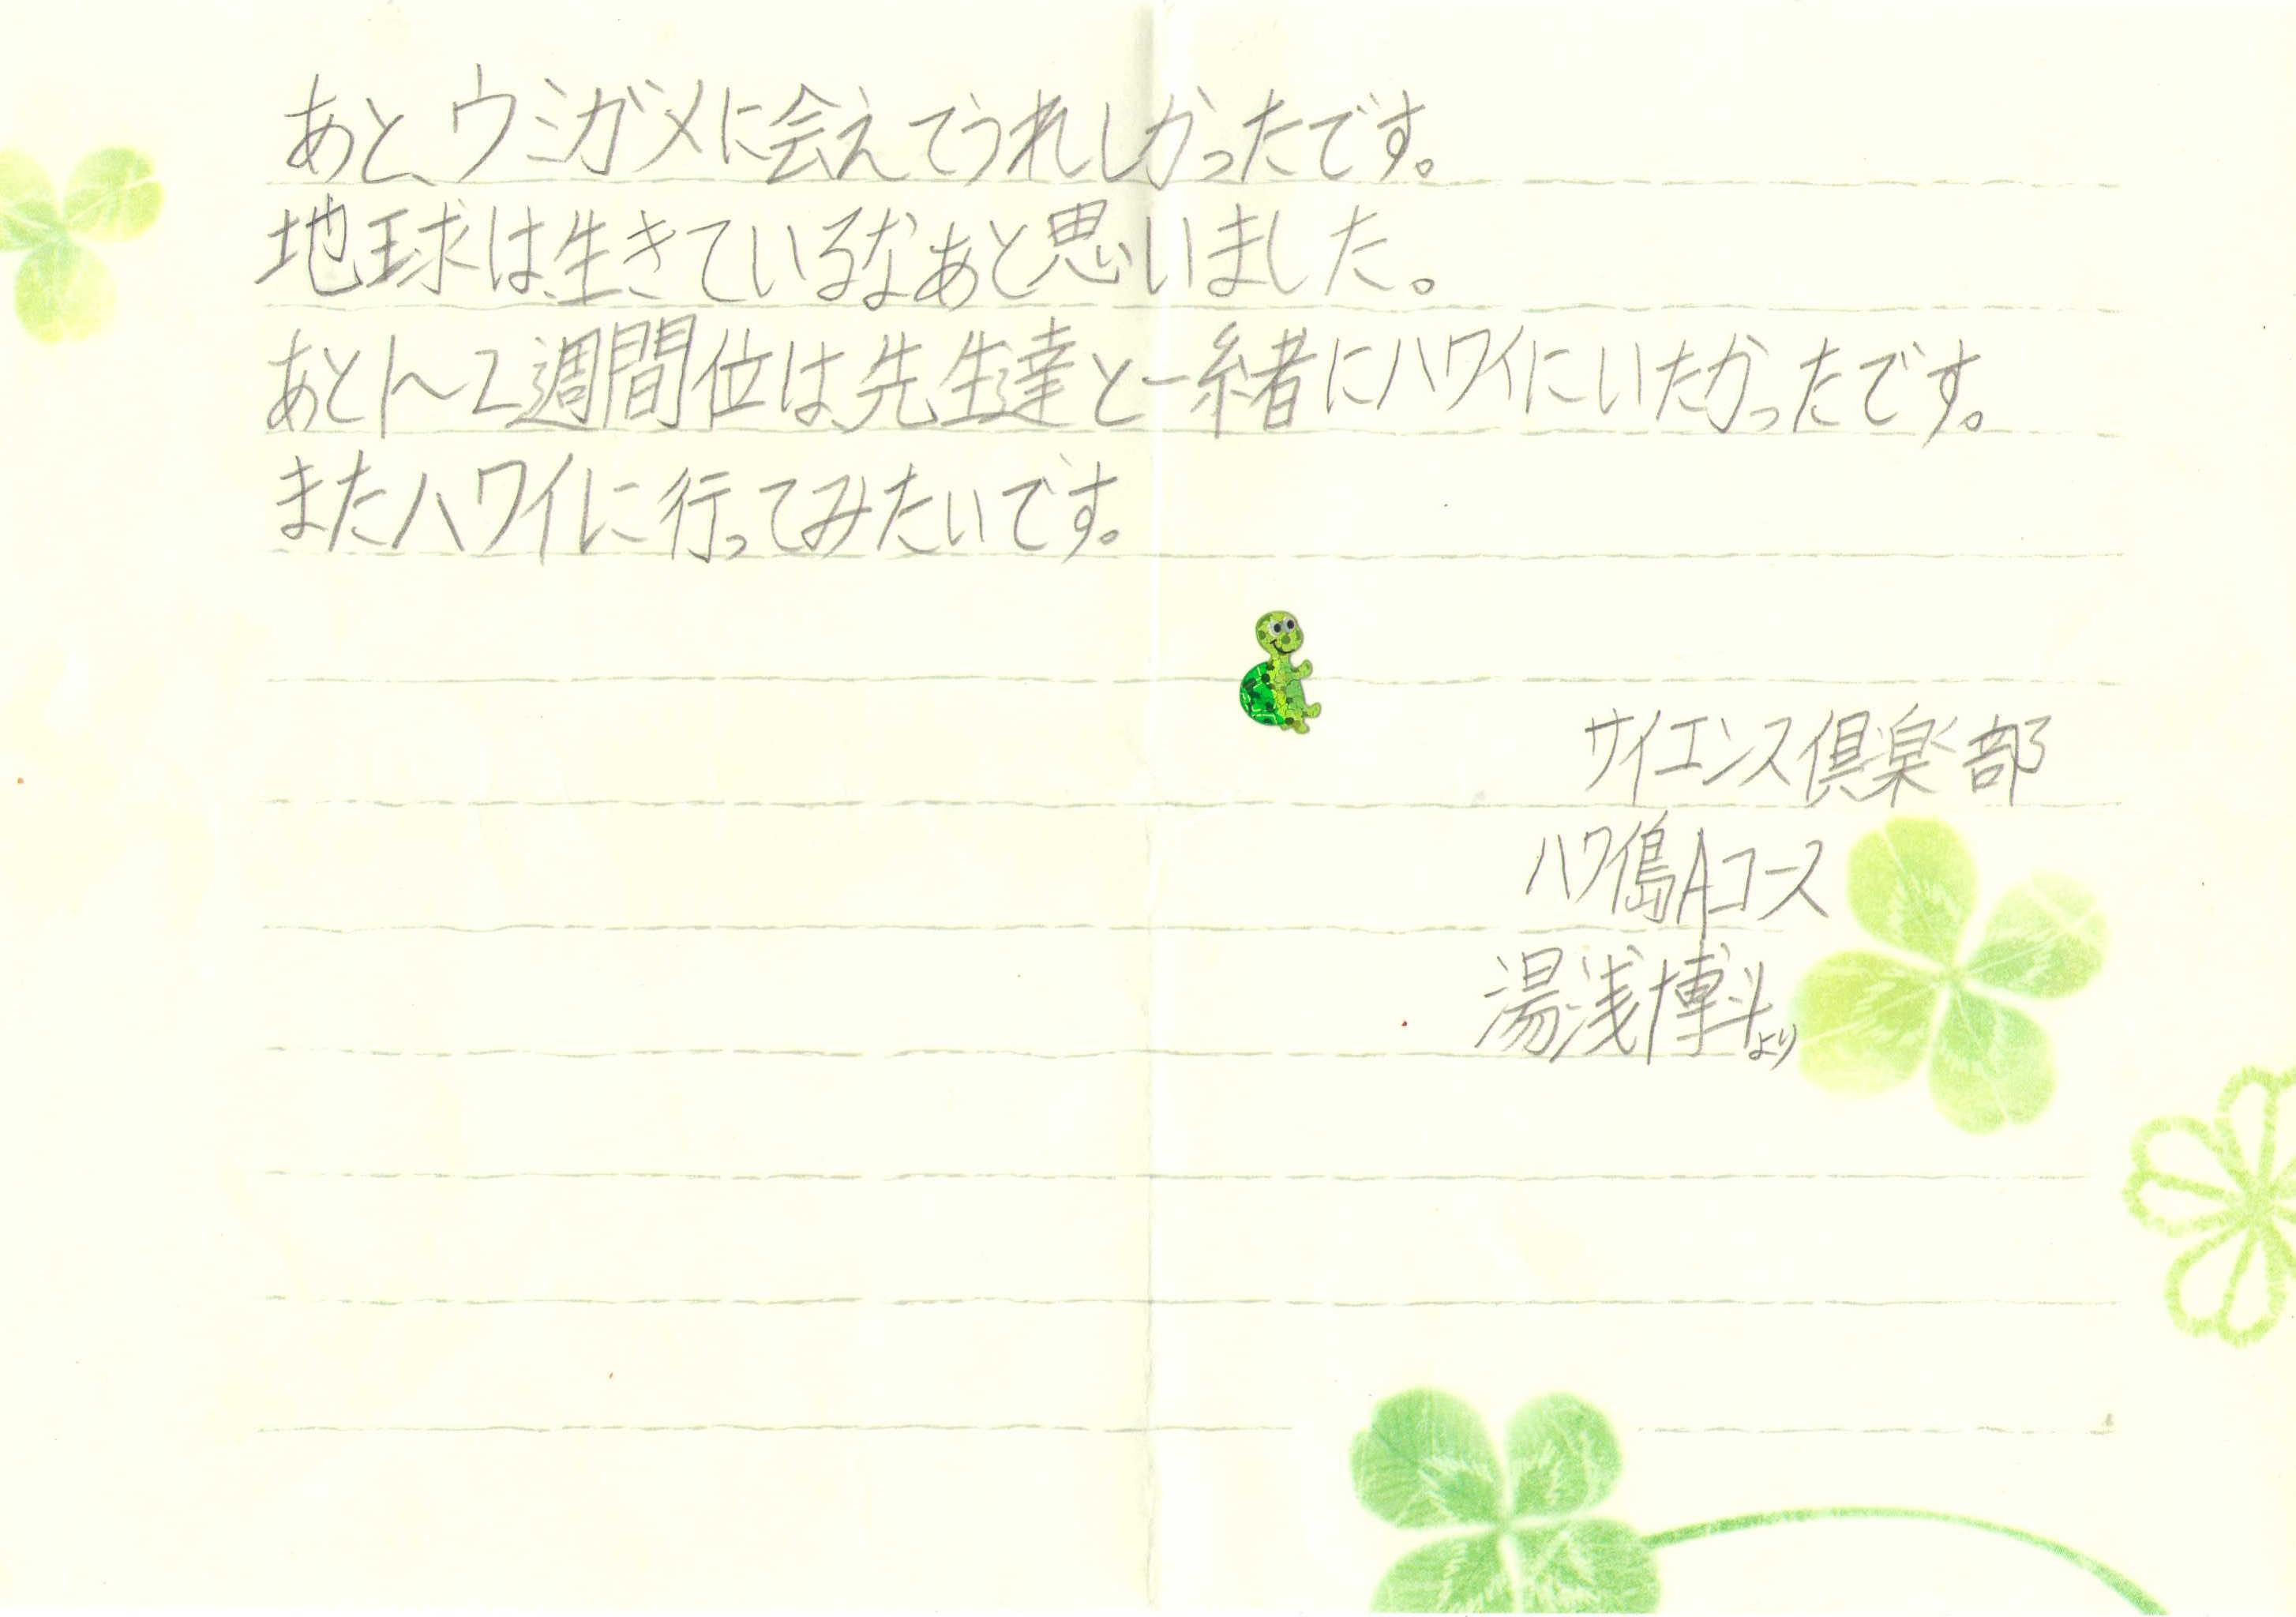 Hiroto Yuasa Page 2